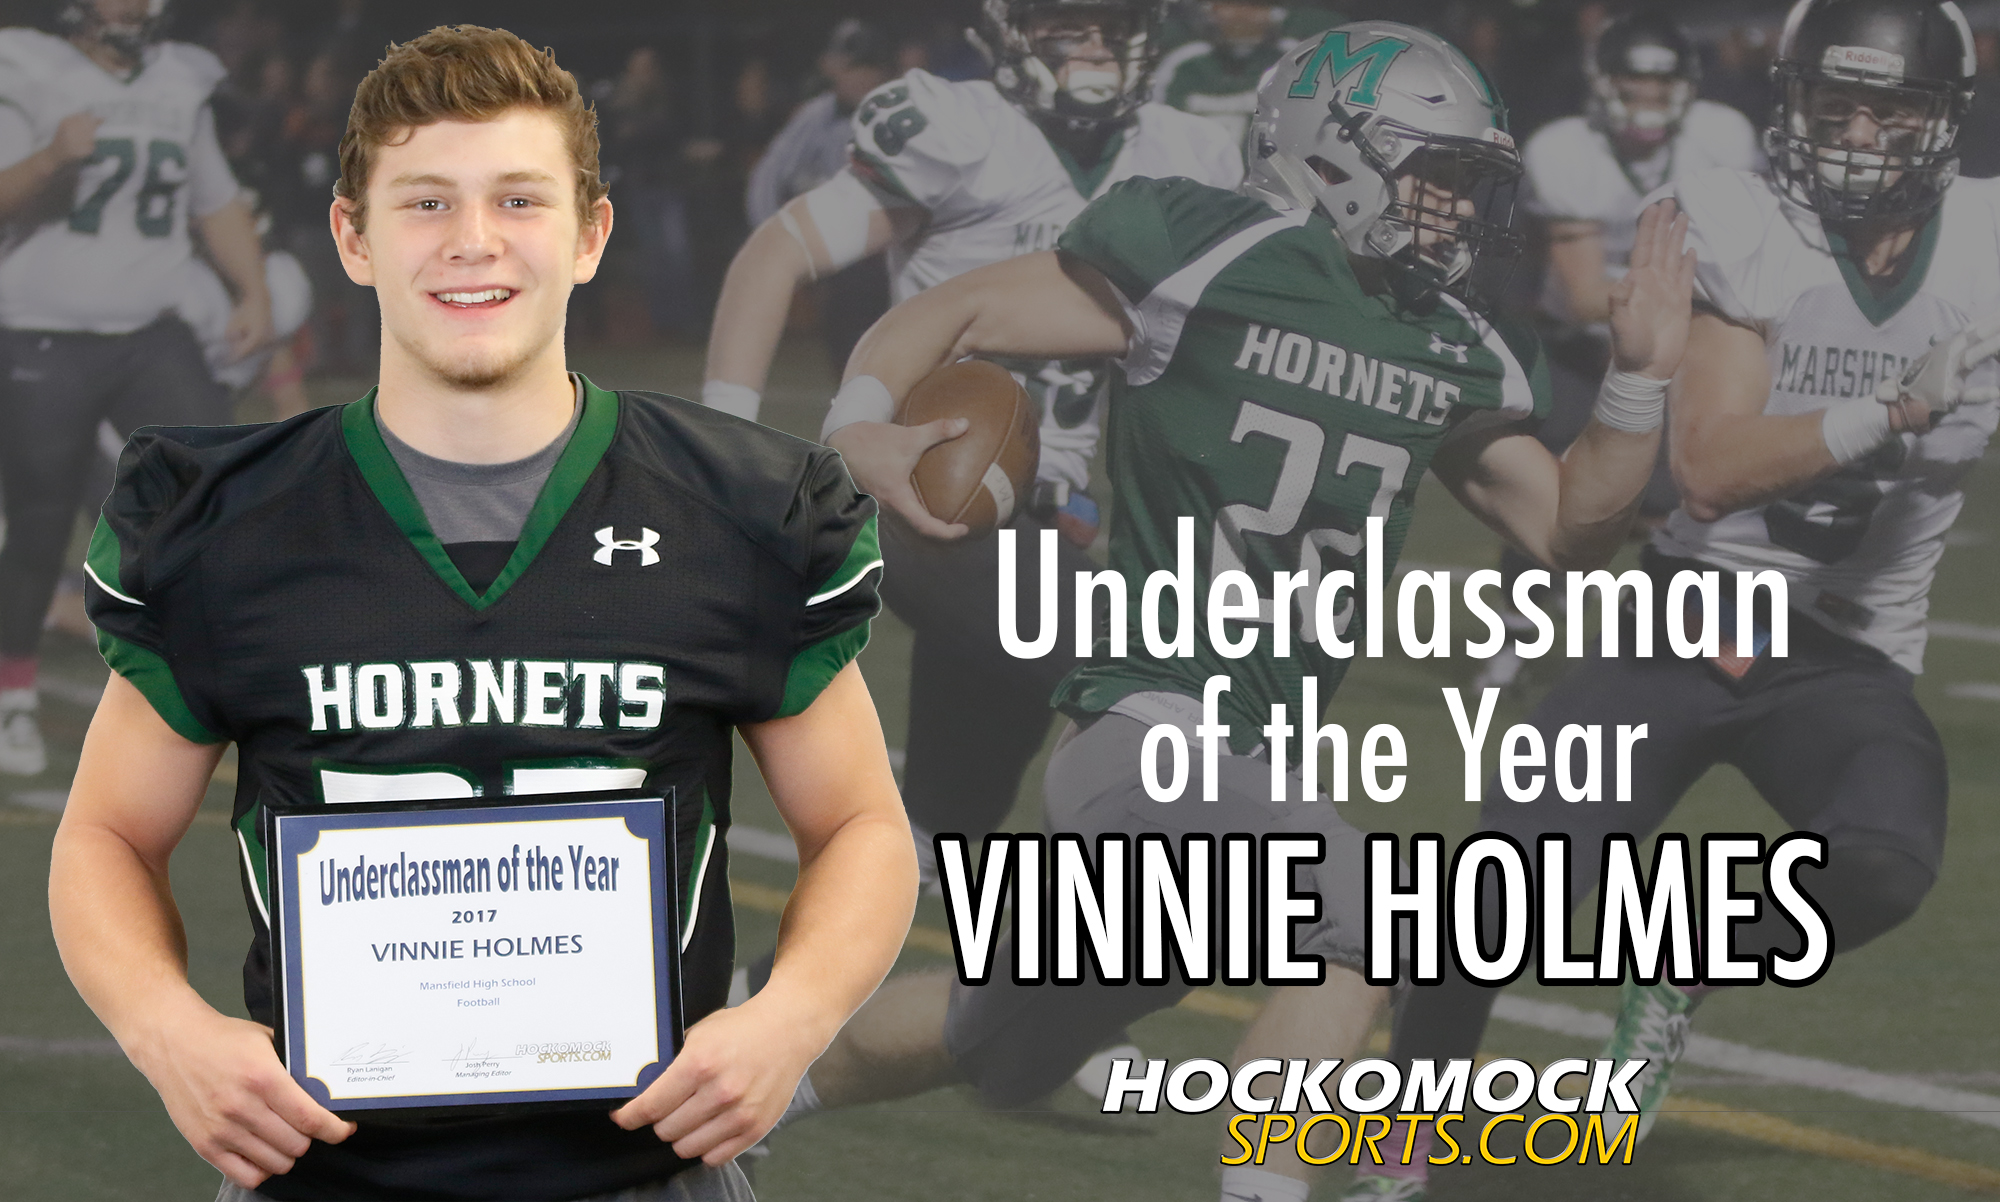 Vinnie Holmes